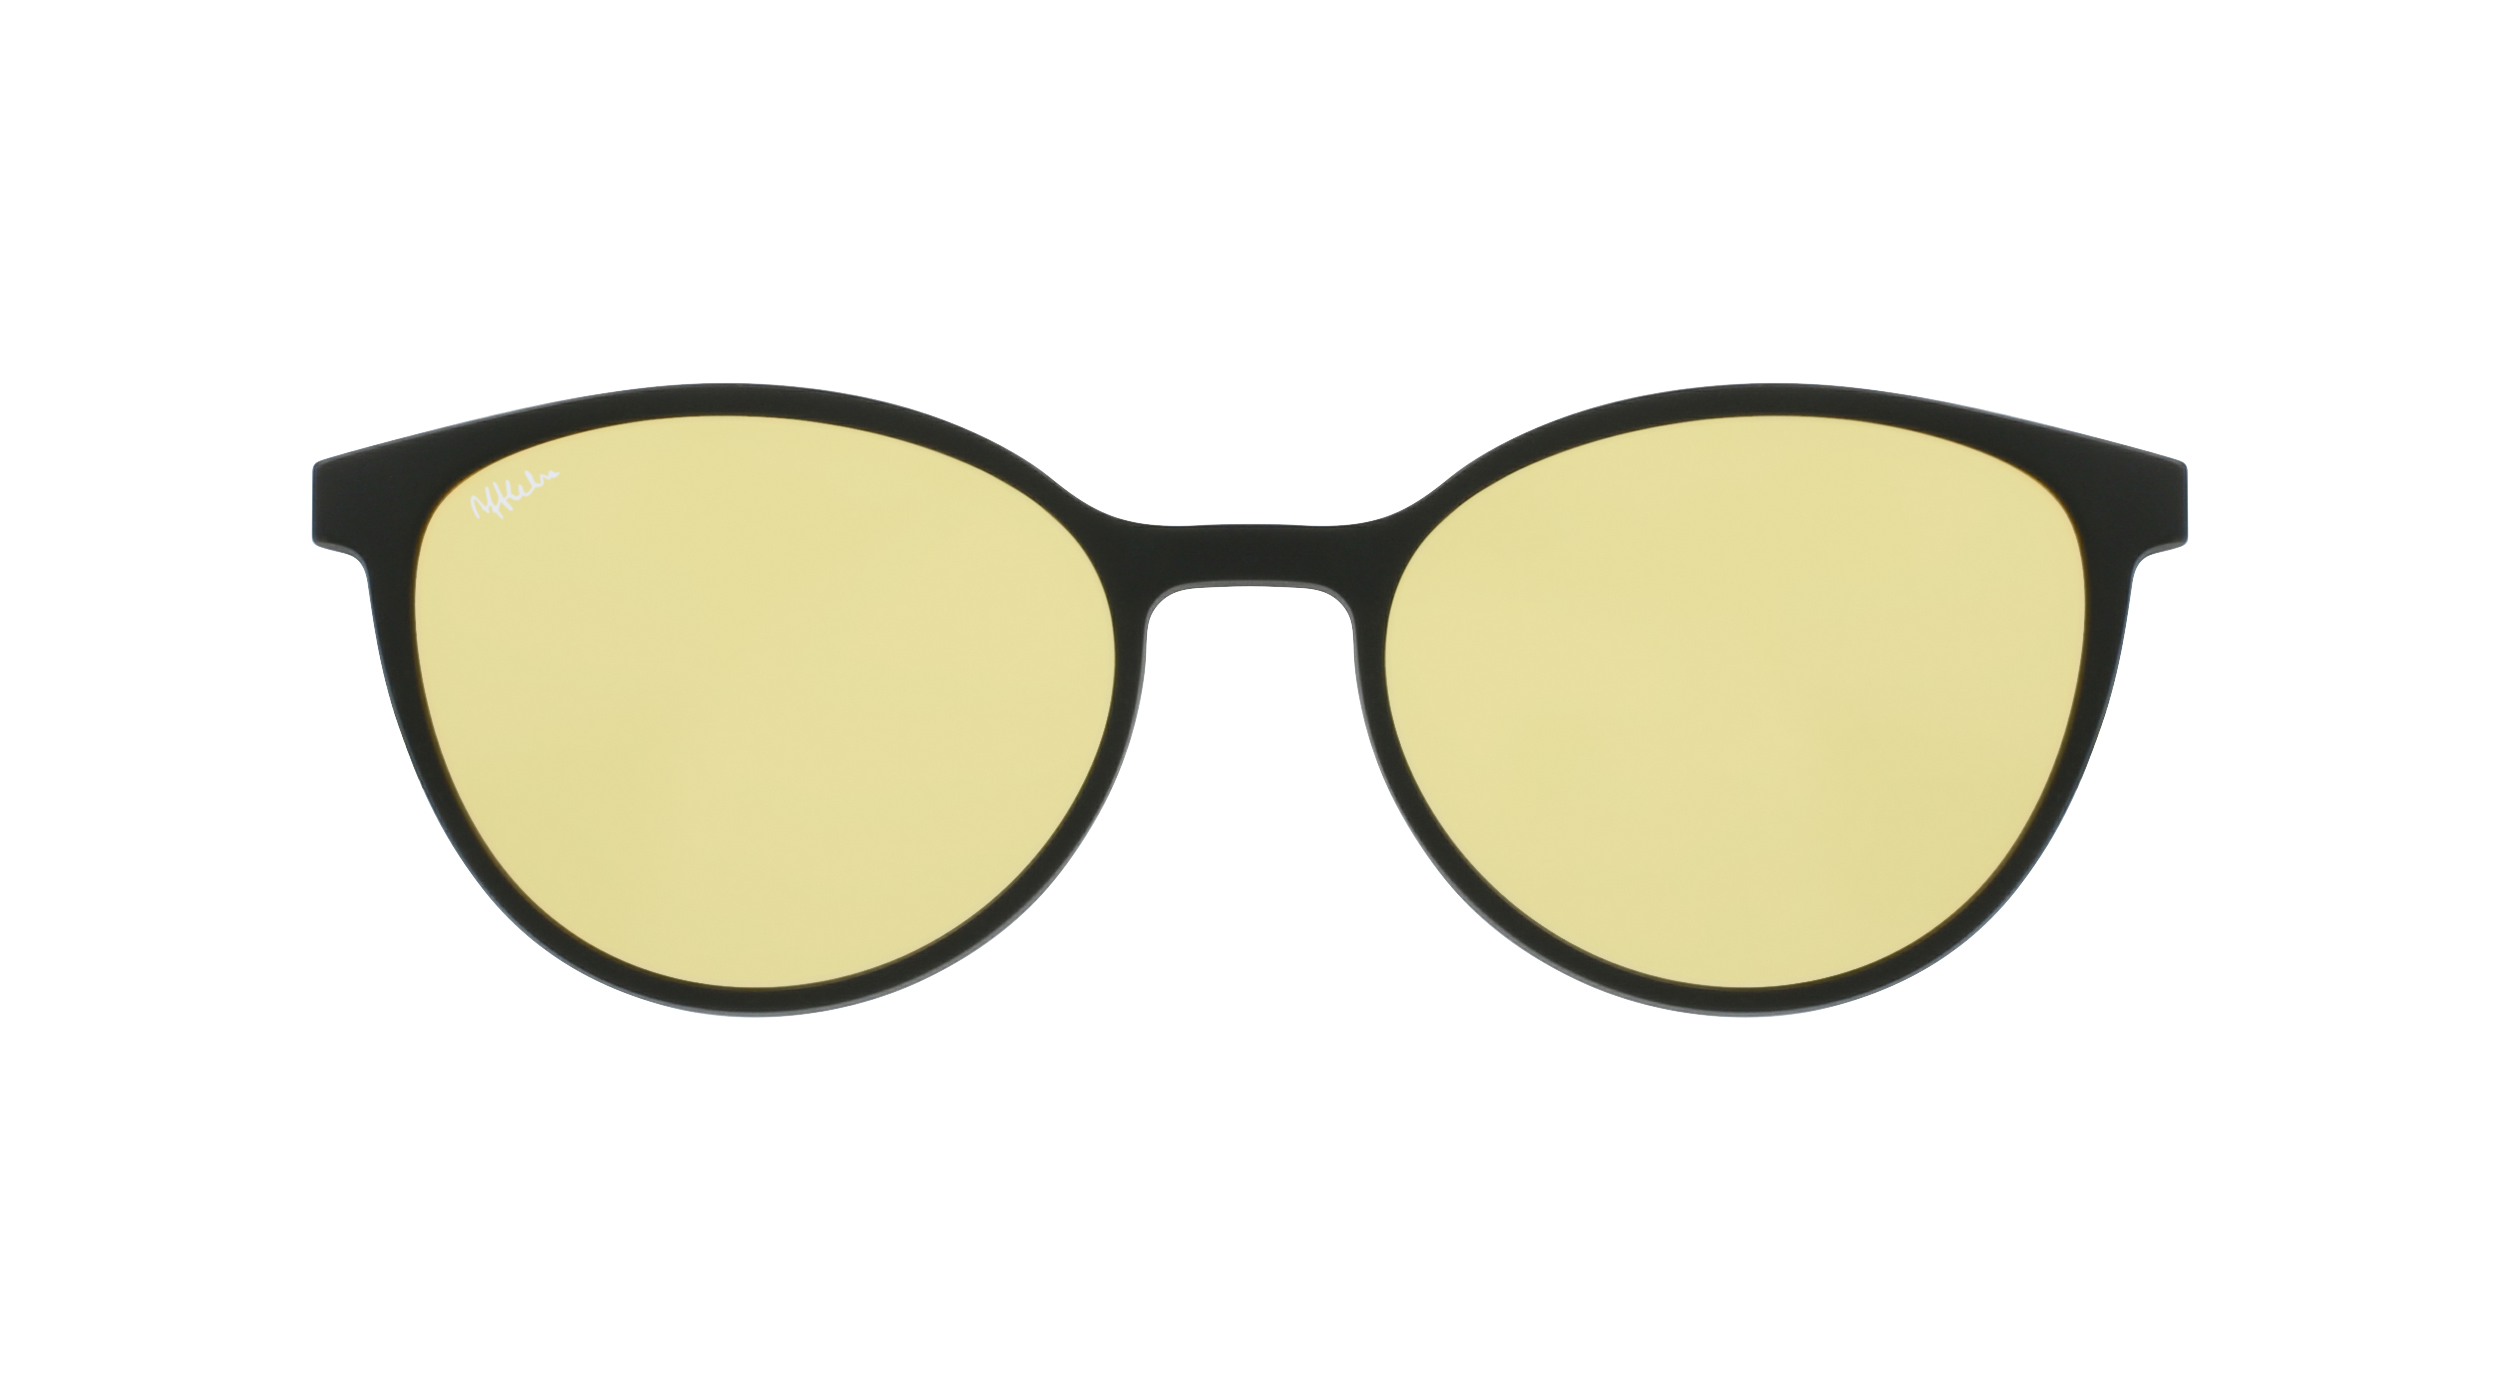 afflelou/france/products/smart_clip/clips_glasses/07630036458976.png